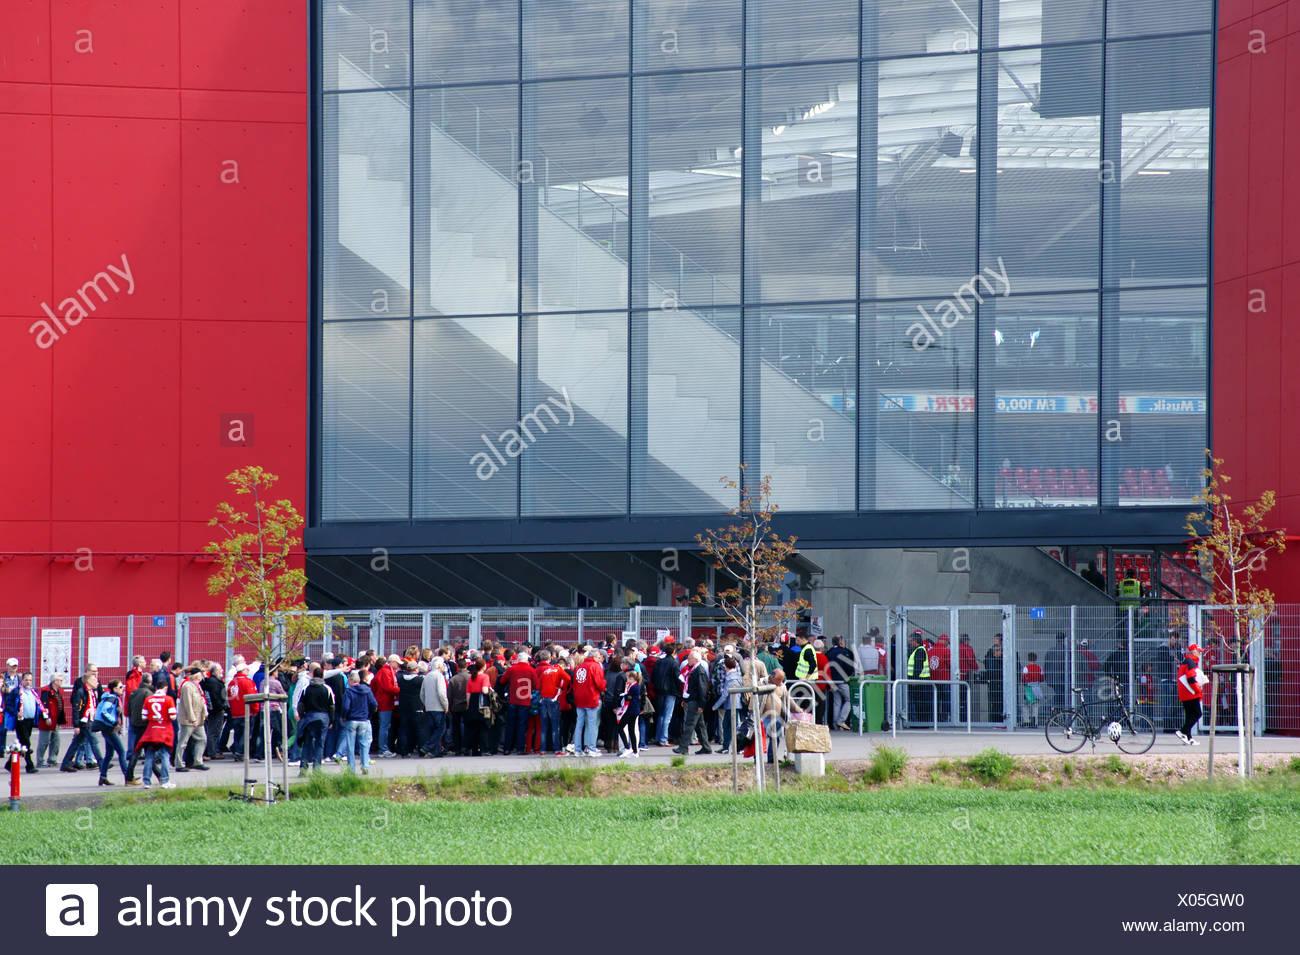 German soccer league - Stock Image